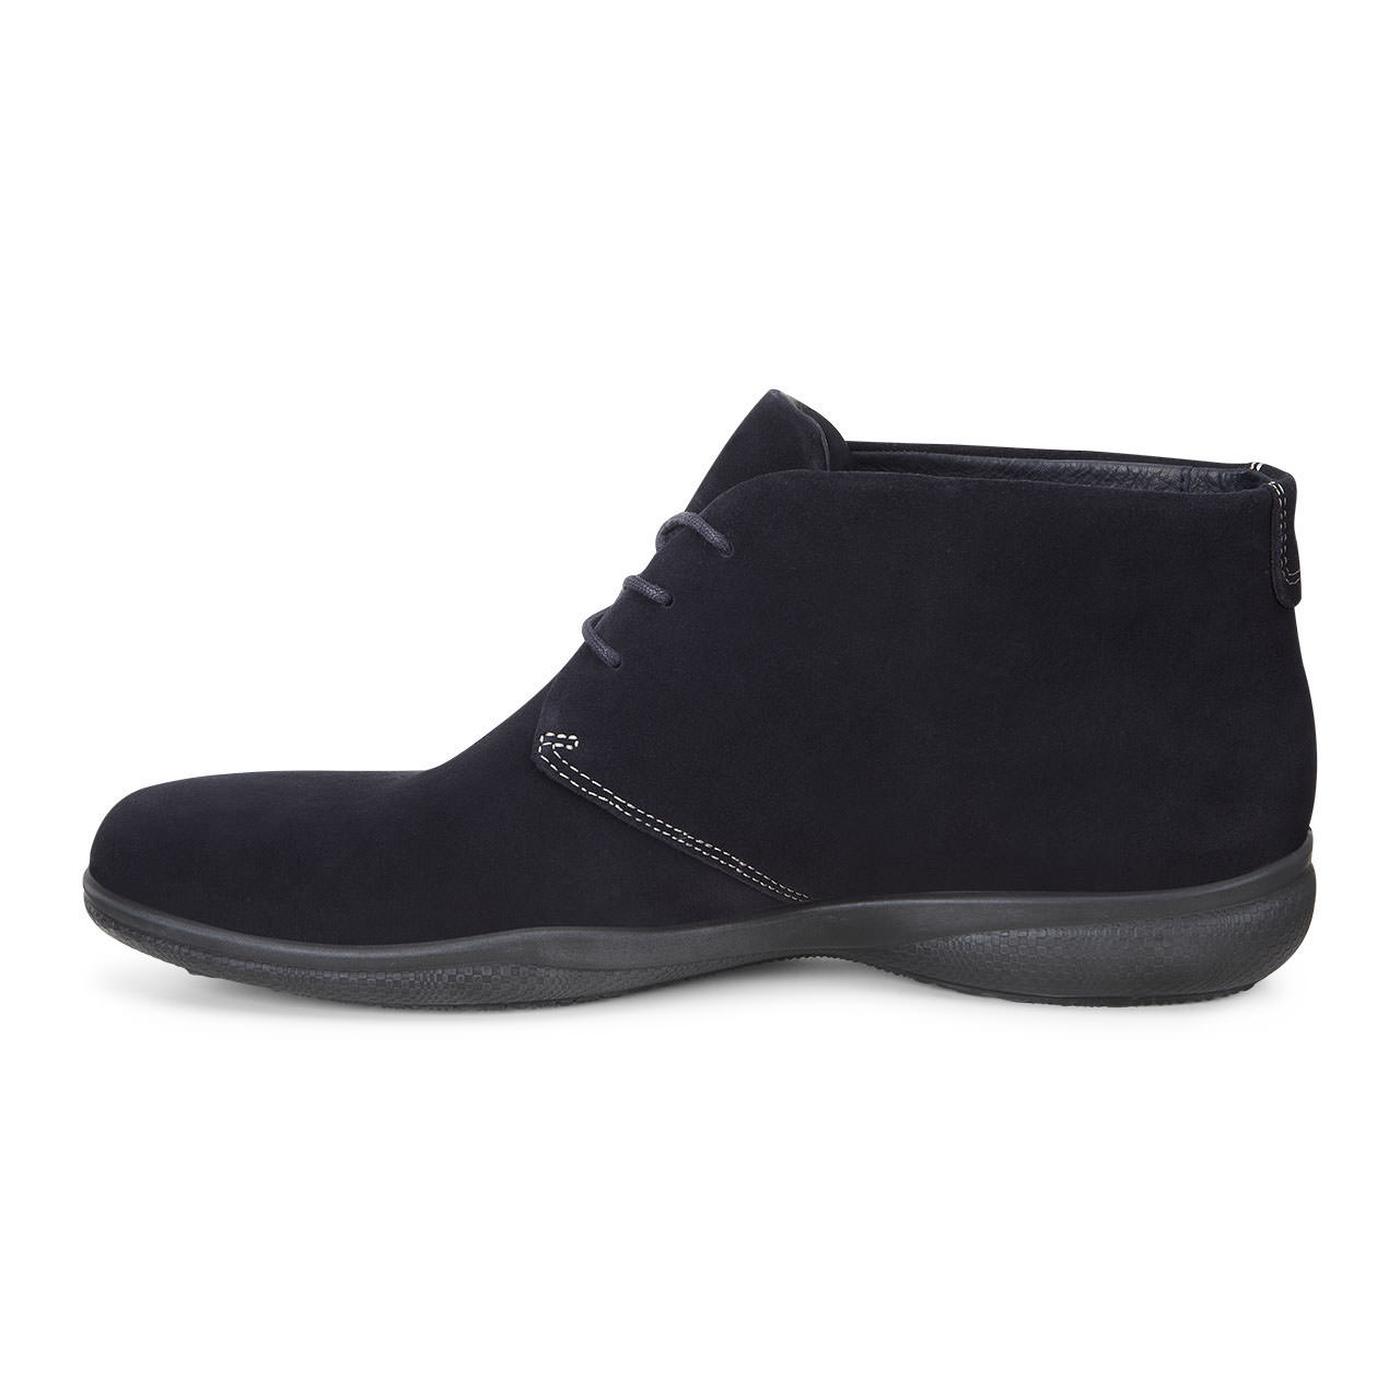 ECCO GRENOBLE Ankle Boot